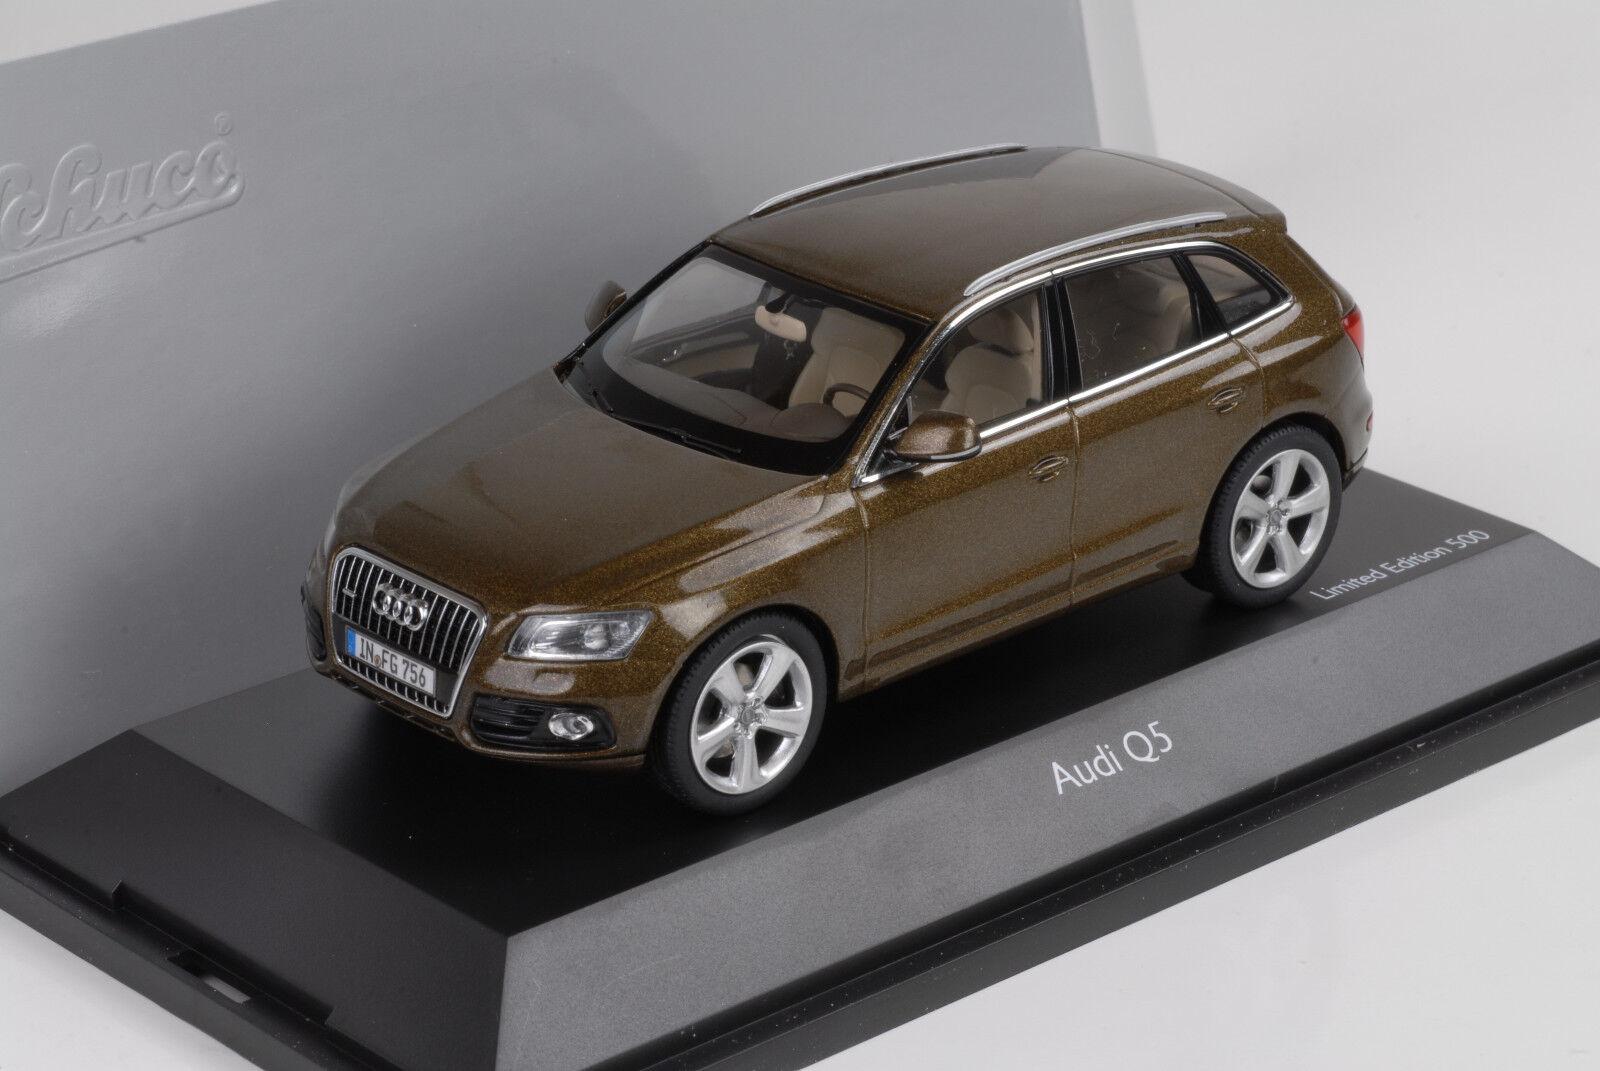 2012 Audi Q5 Mayabrown 1 43 Schuco